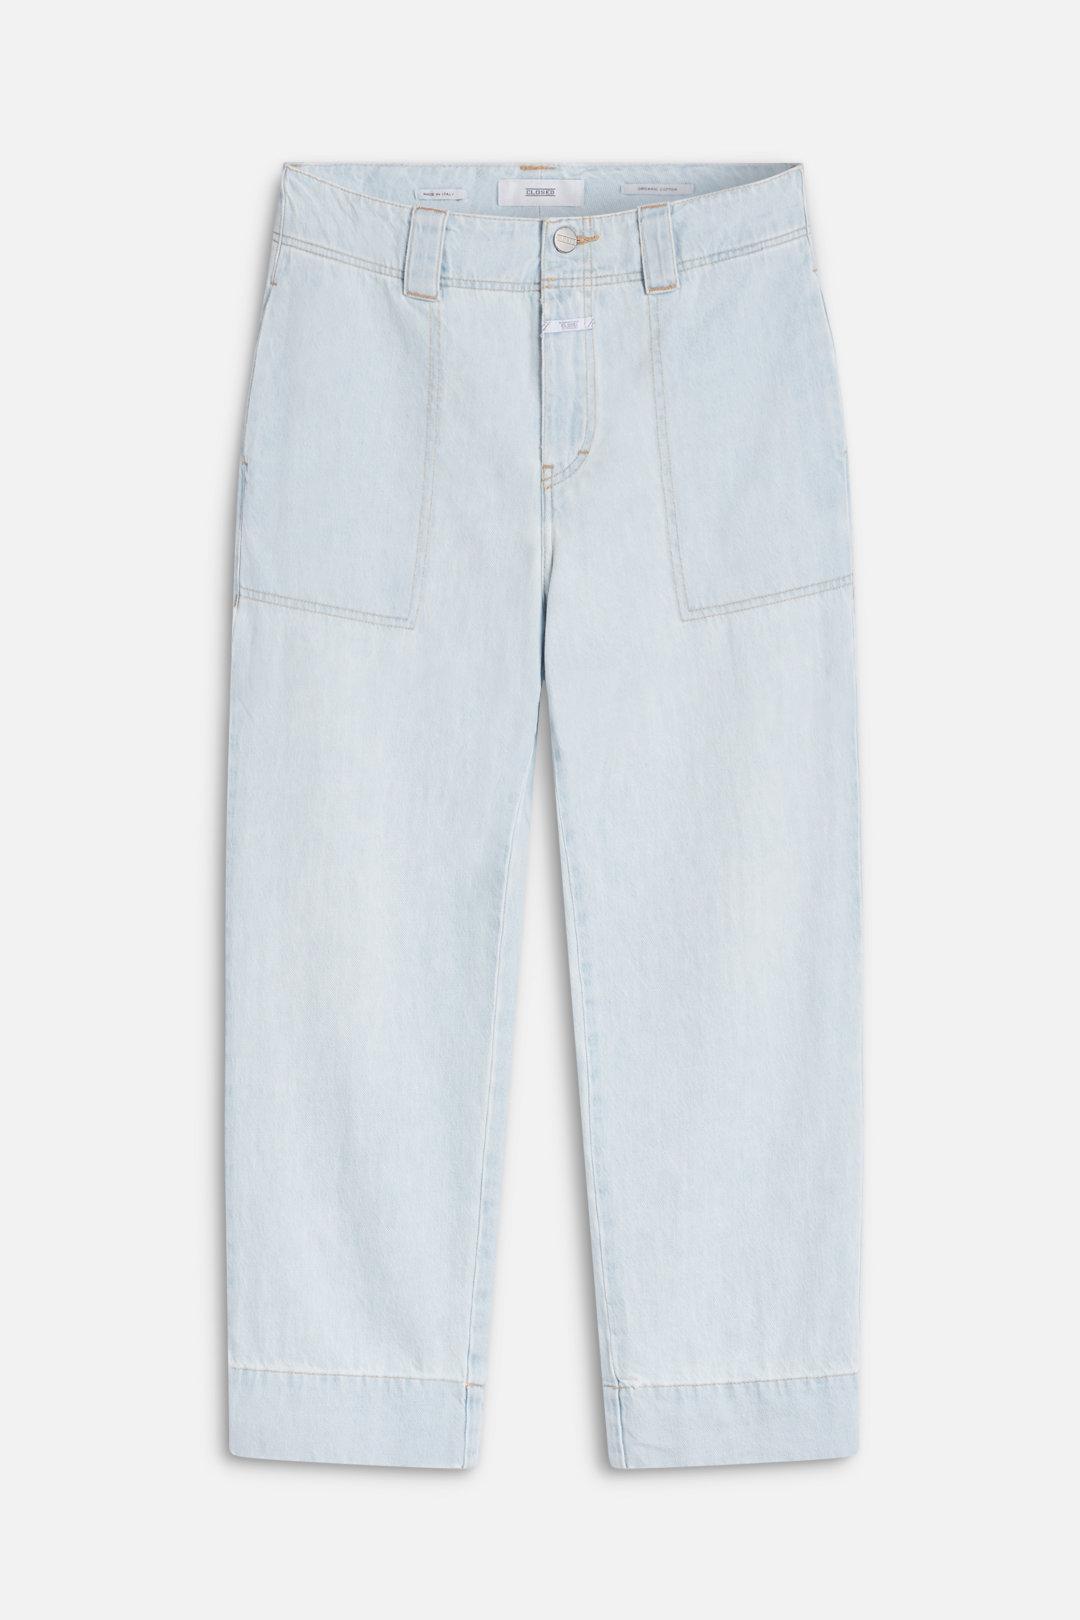 Jeans, Josy, Closed, Workwear